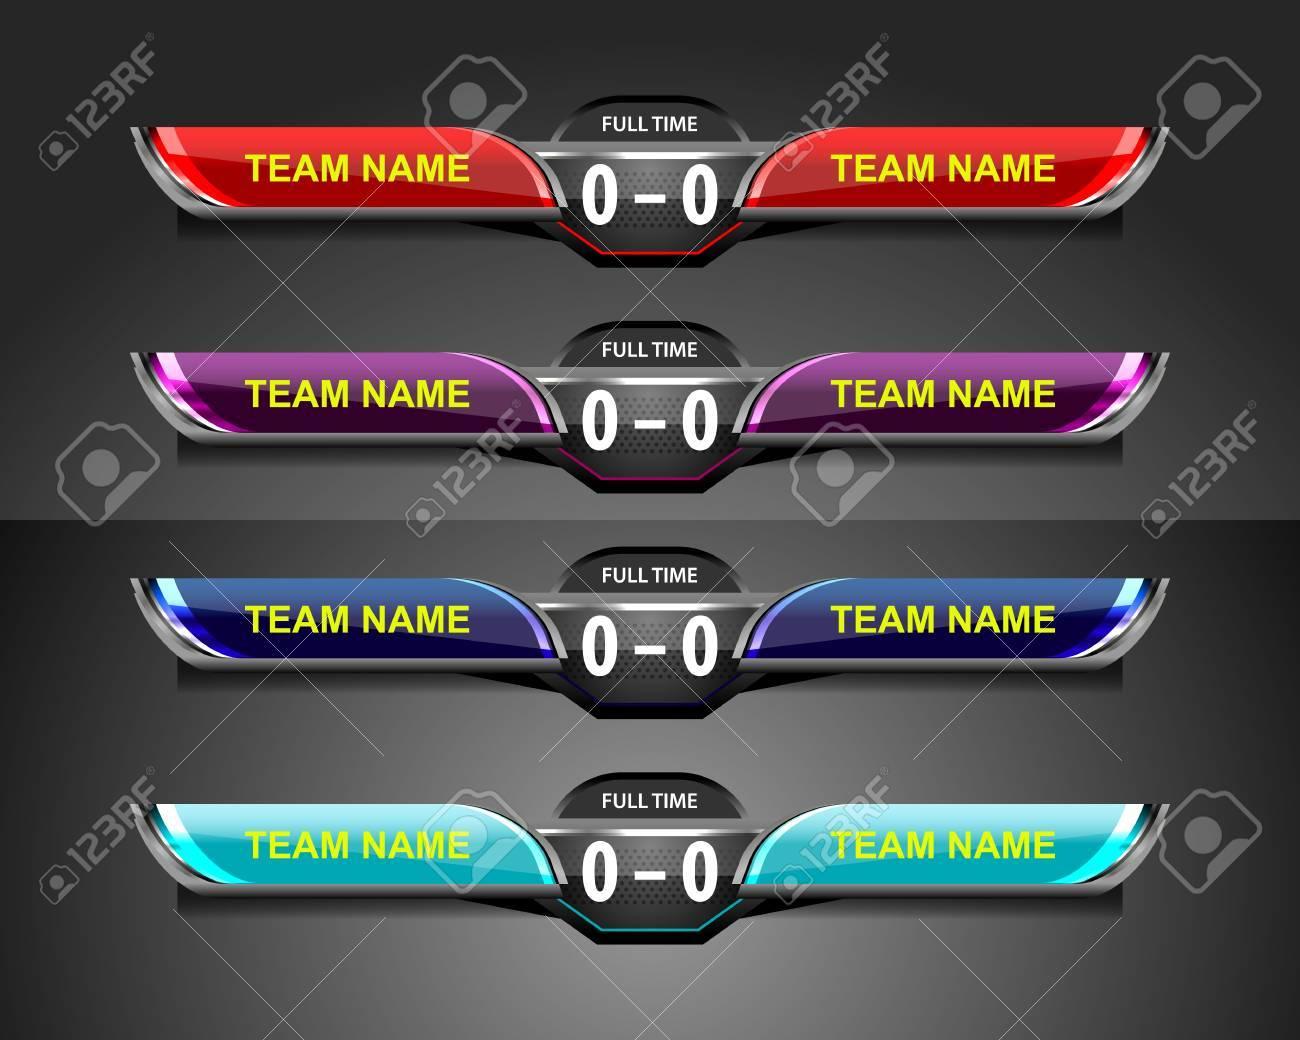 jeopardy powerpoint template with scoreboard gallery - templates, Modern powerpoint